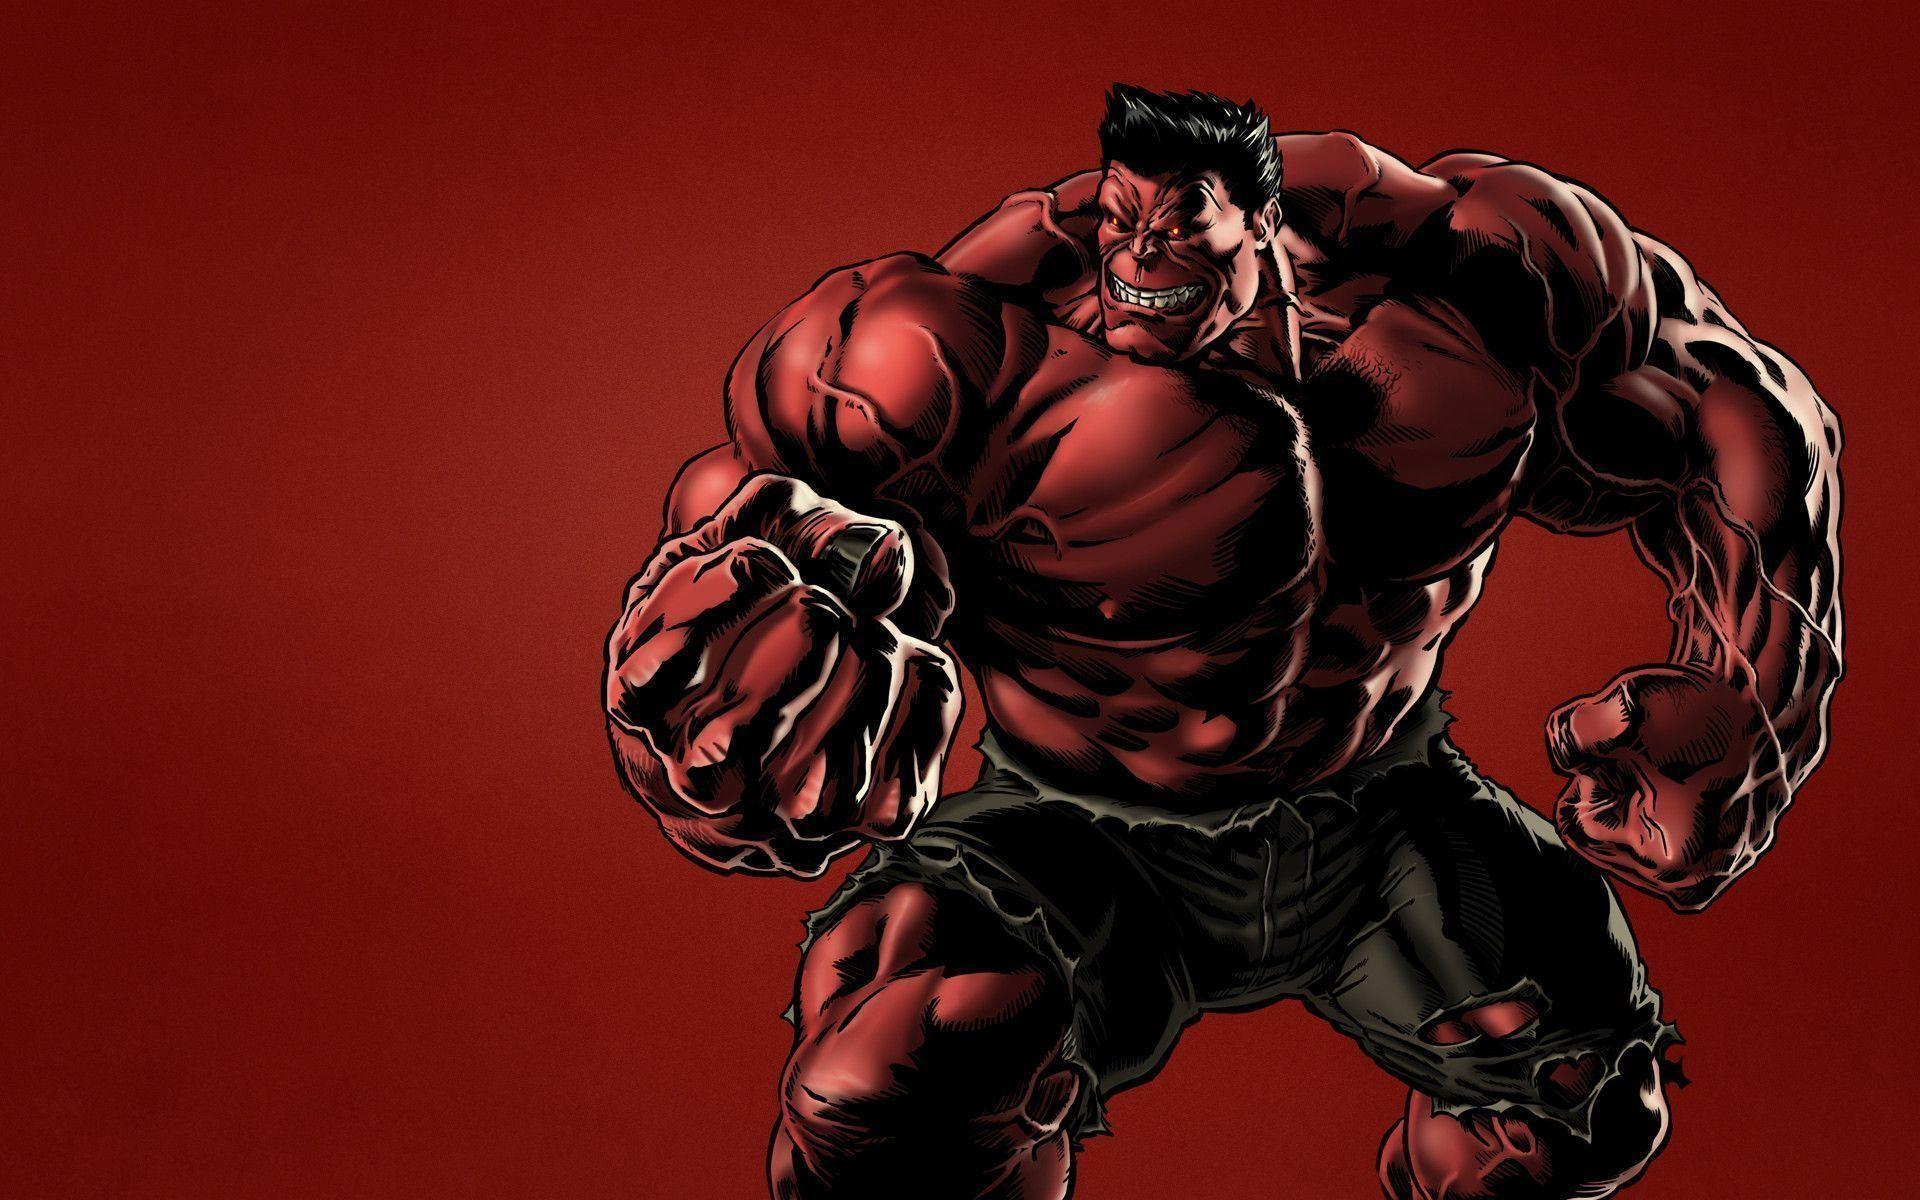 Res: 1920x1200, Red Hulk Wallpaper HD